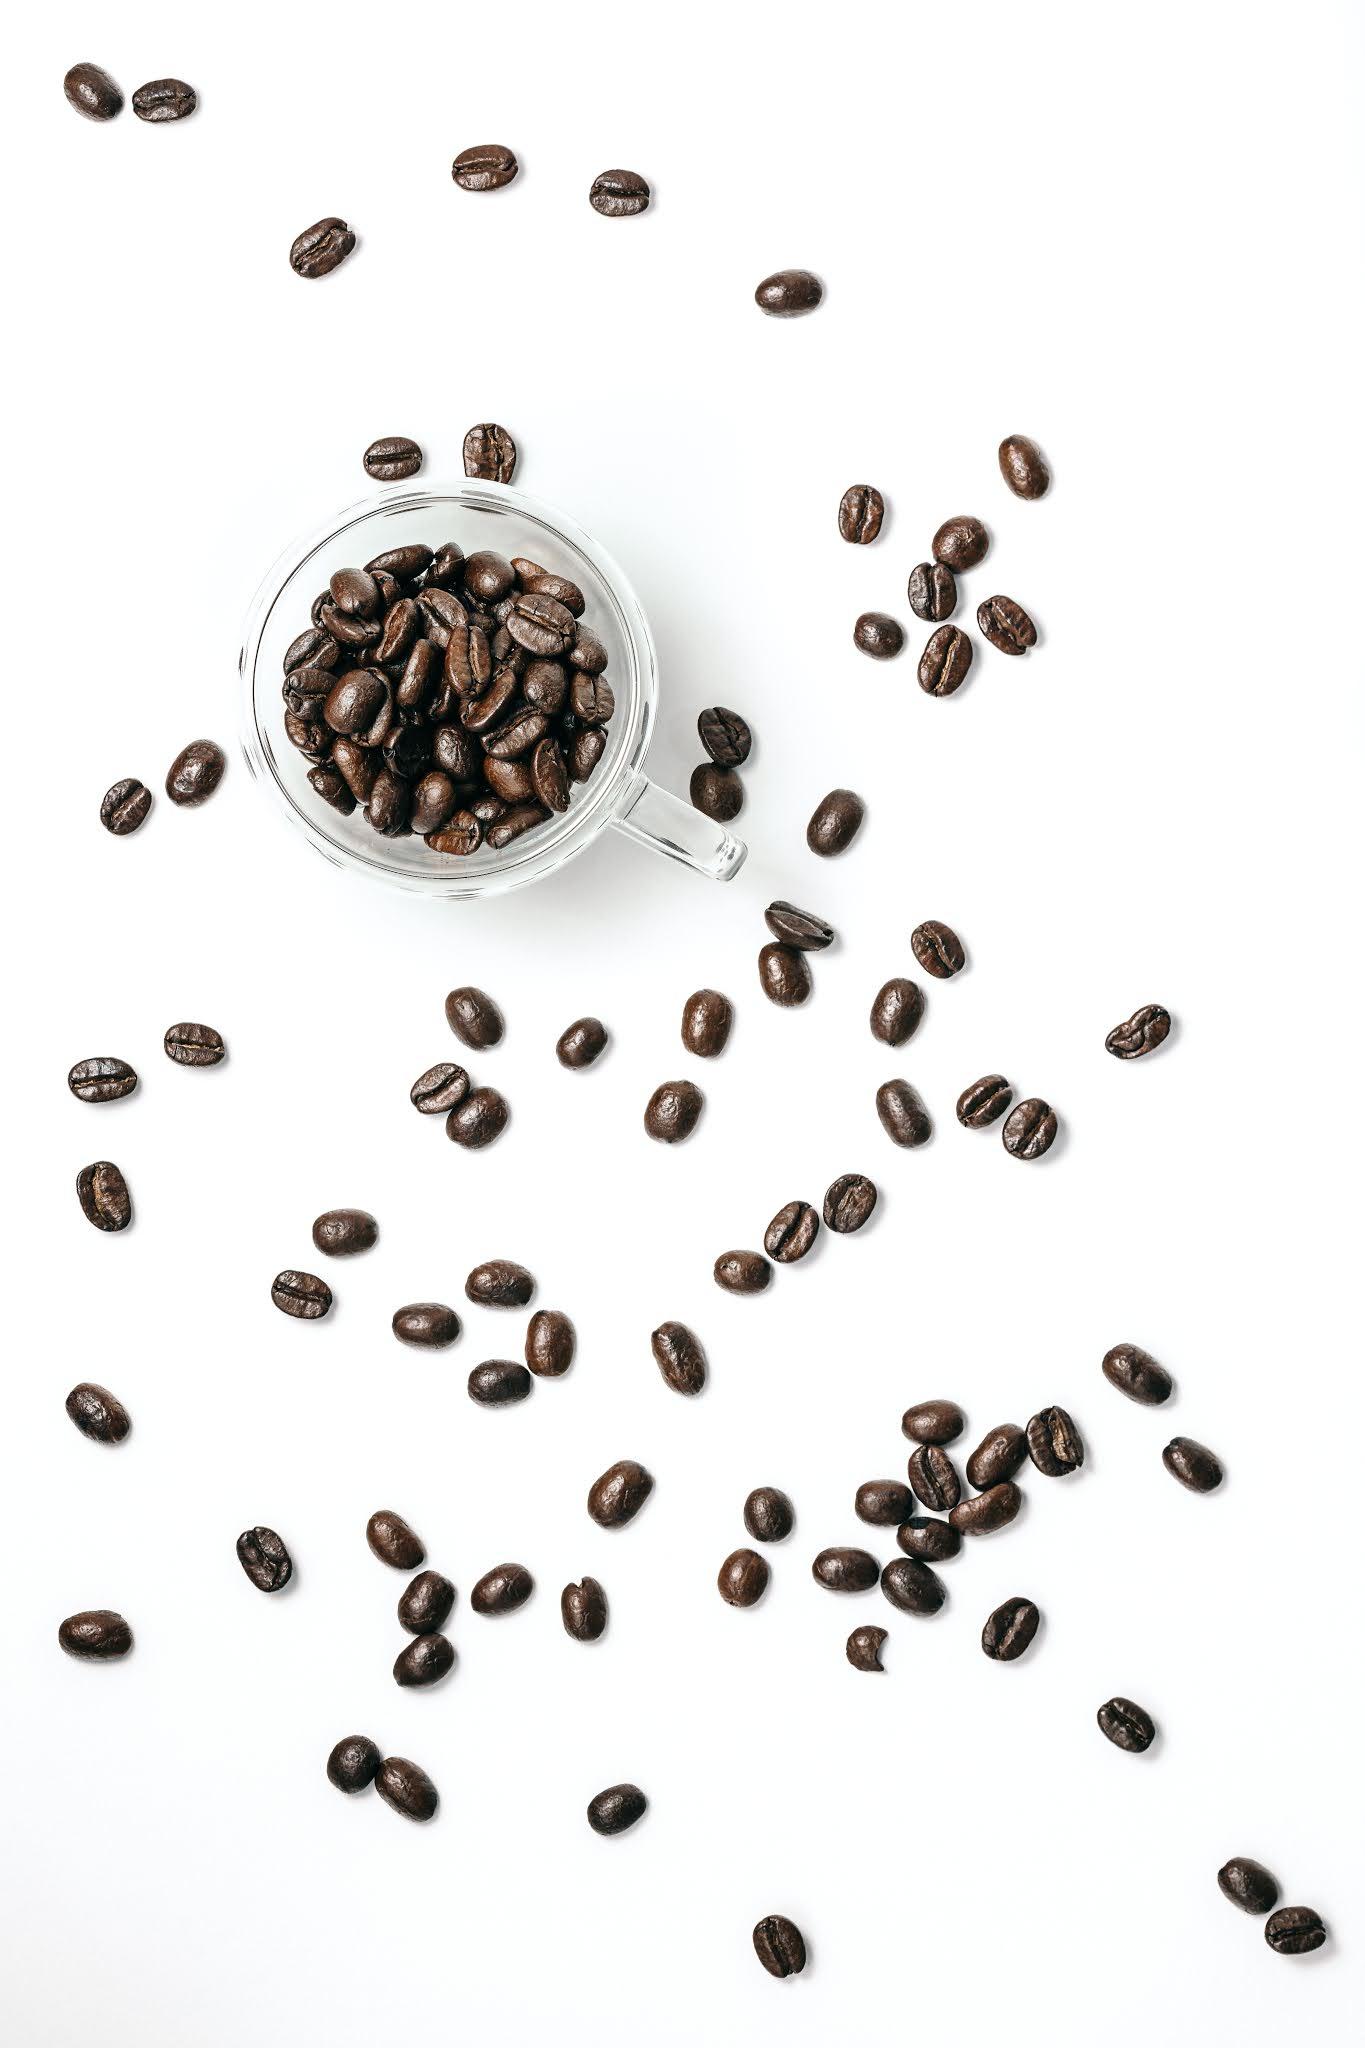 Najlepsza kawa ziarnista: ranking 2021